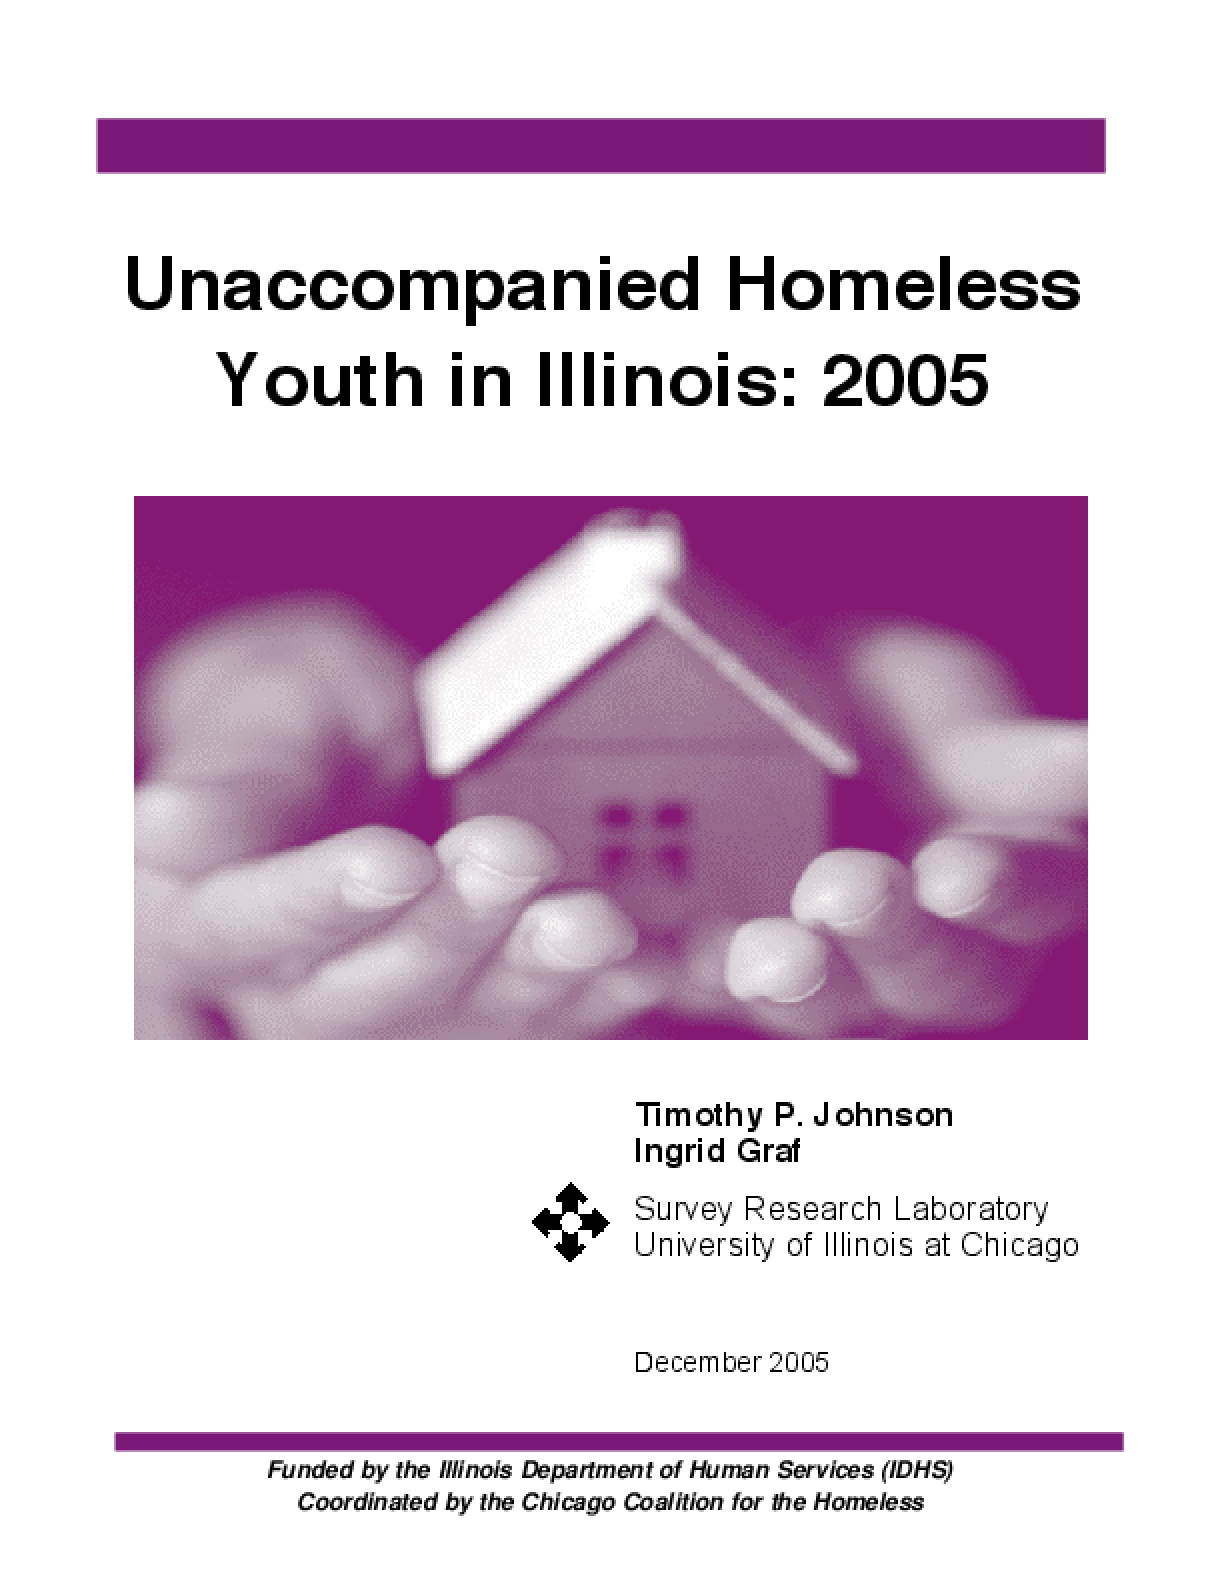 Unaccompanied Homeless Youth in Illinois: 2005